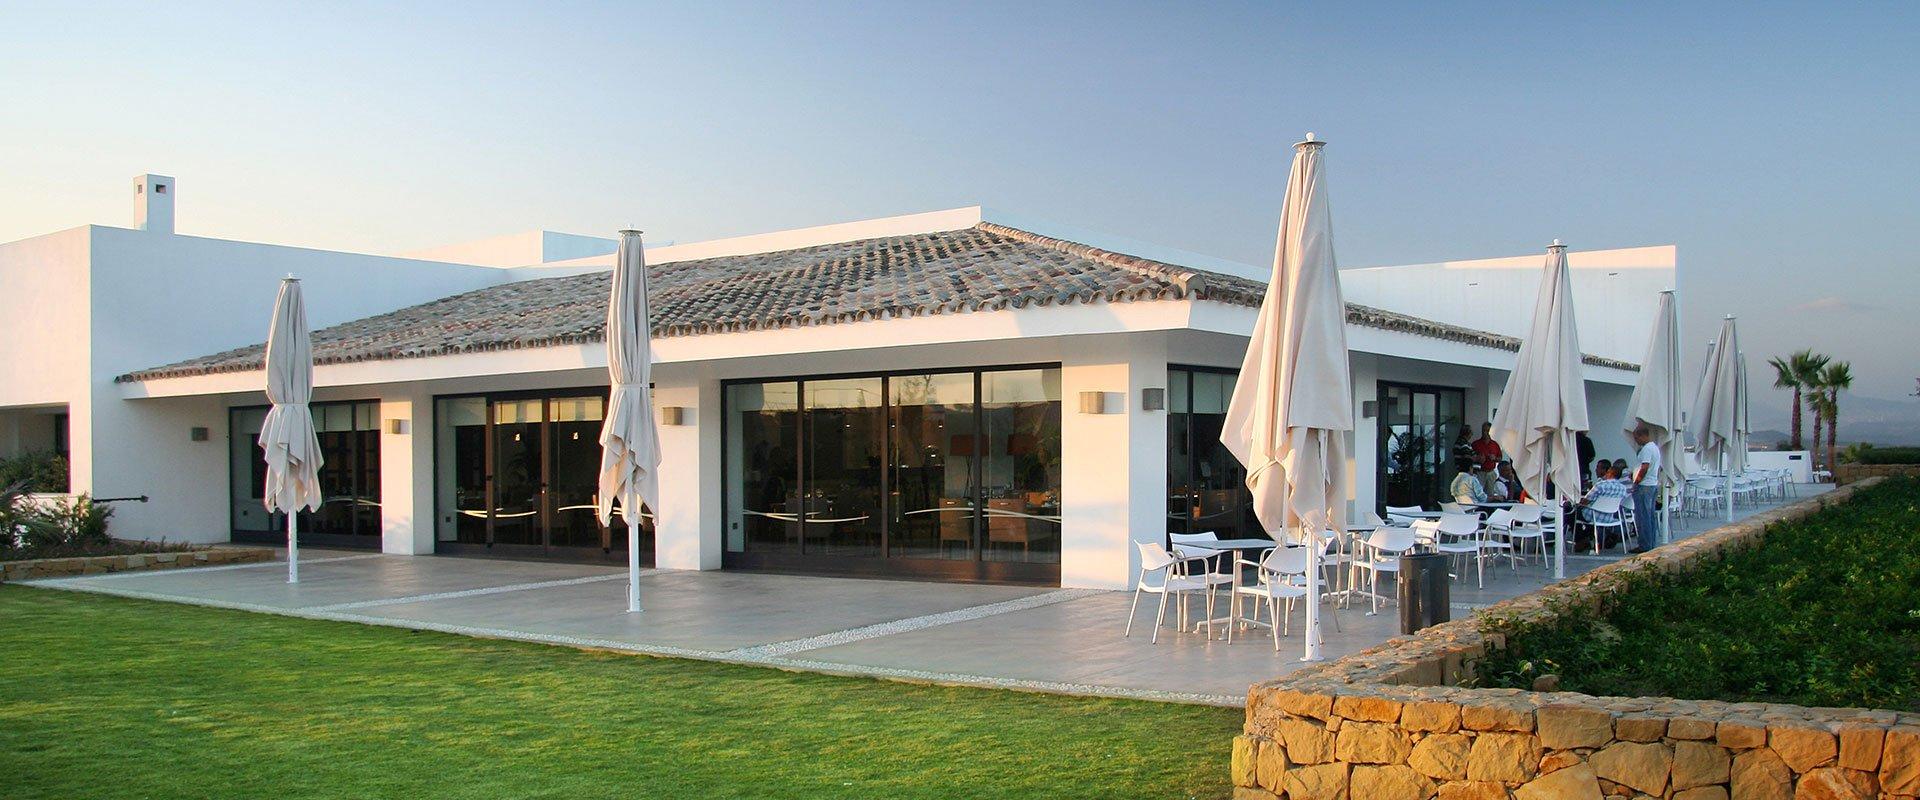 image Alcaidesa Club House - Grupo Alcaidesa